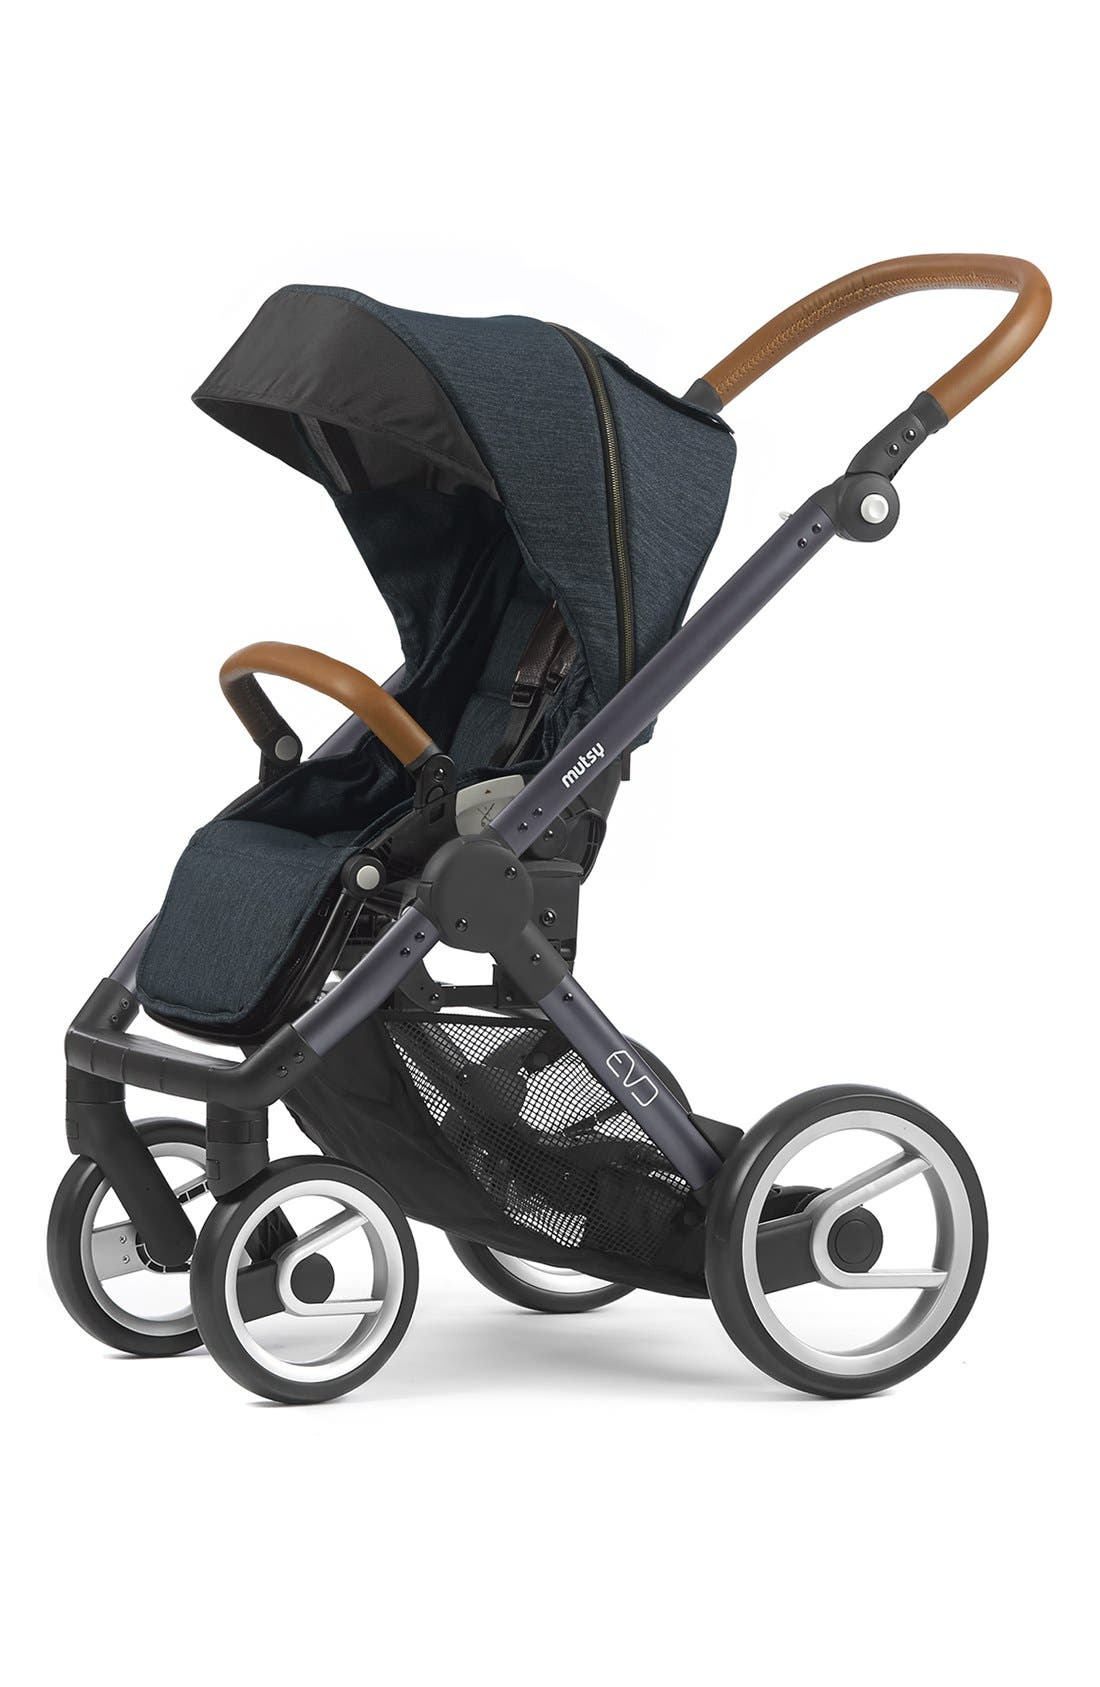 Mutsy 'Evo - Industrial' Stroller